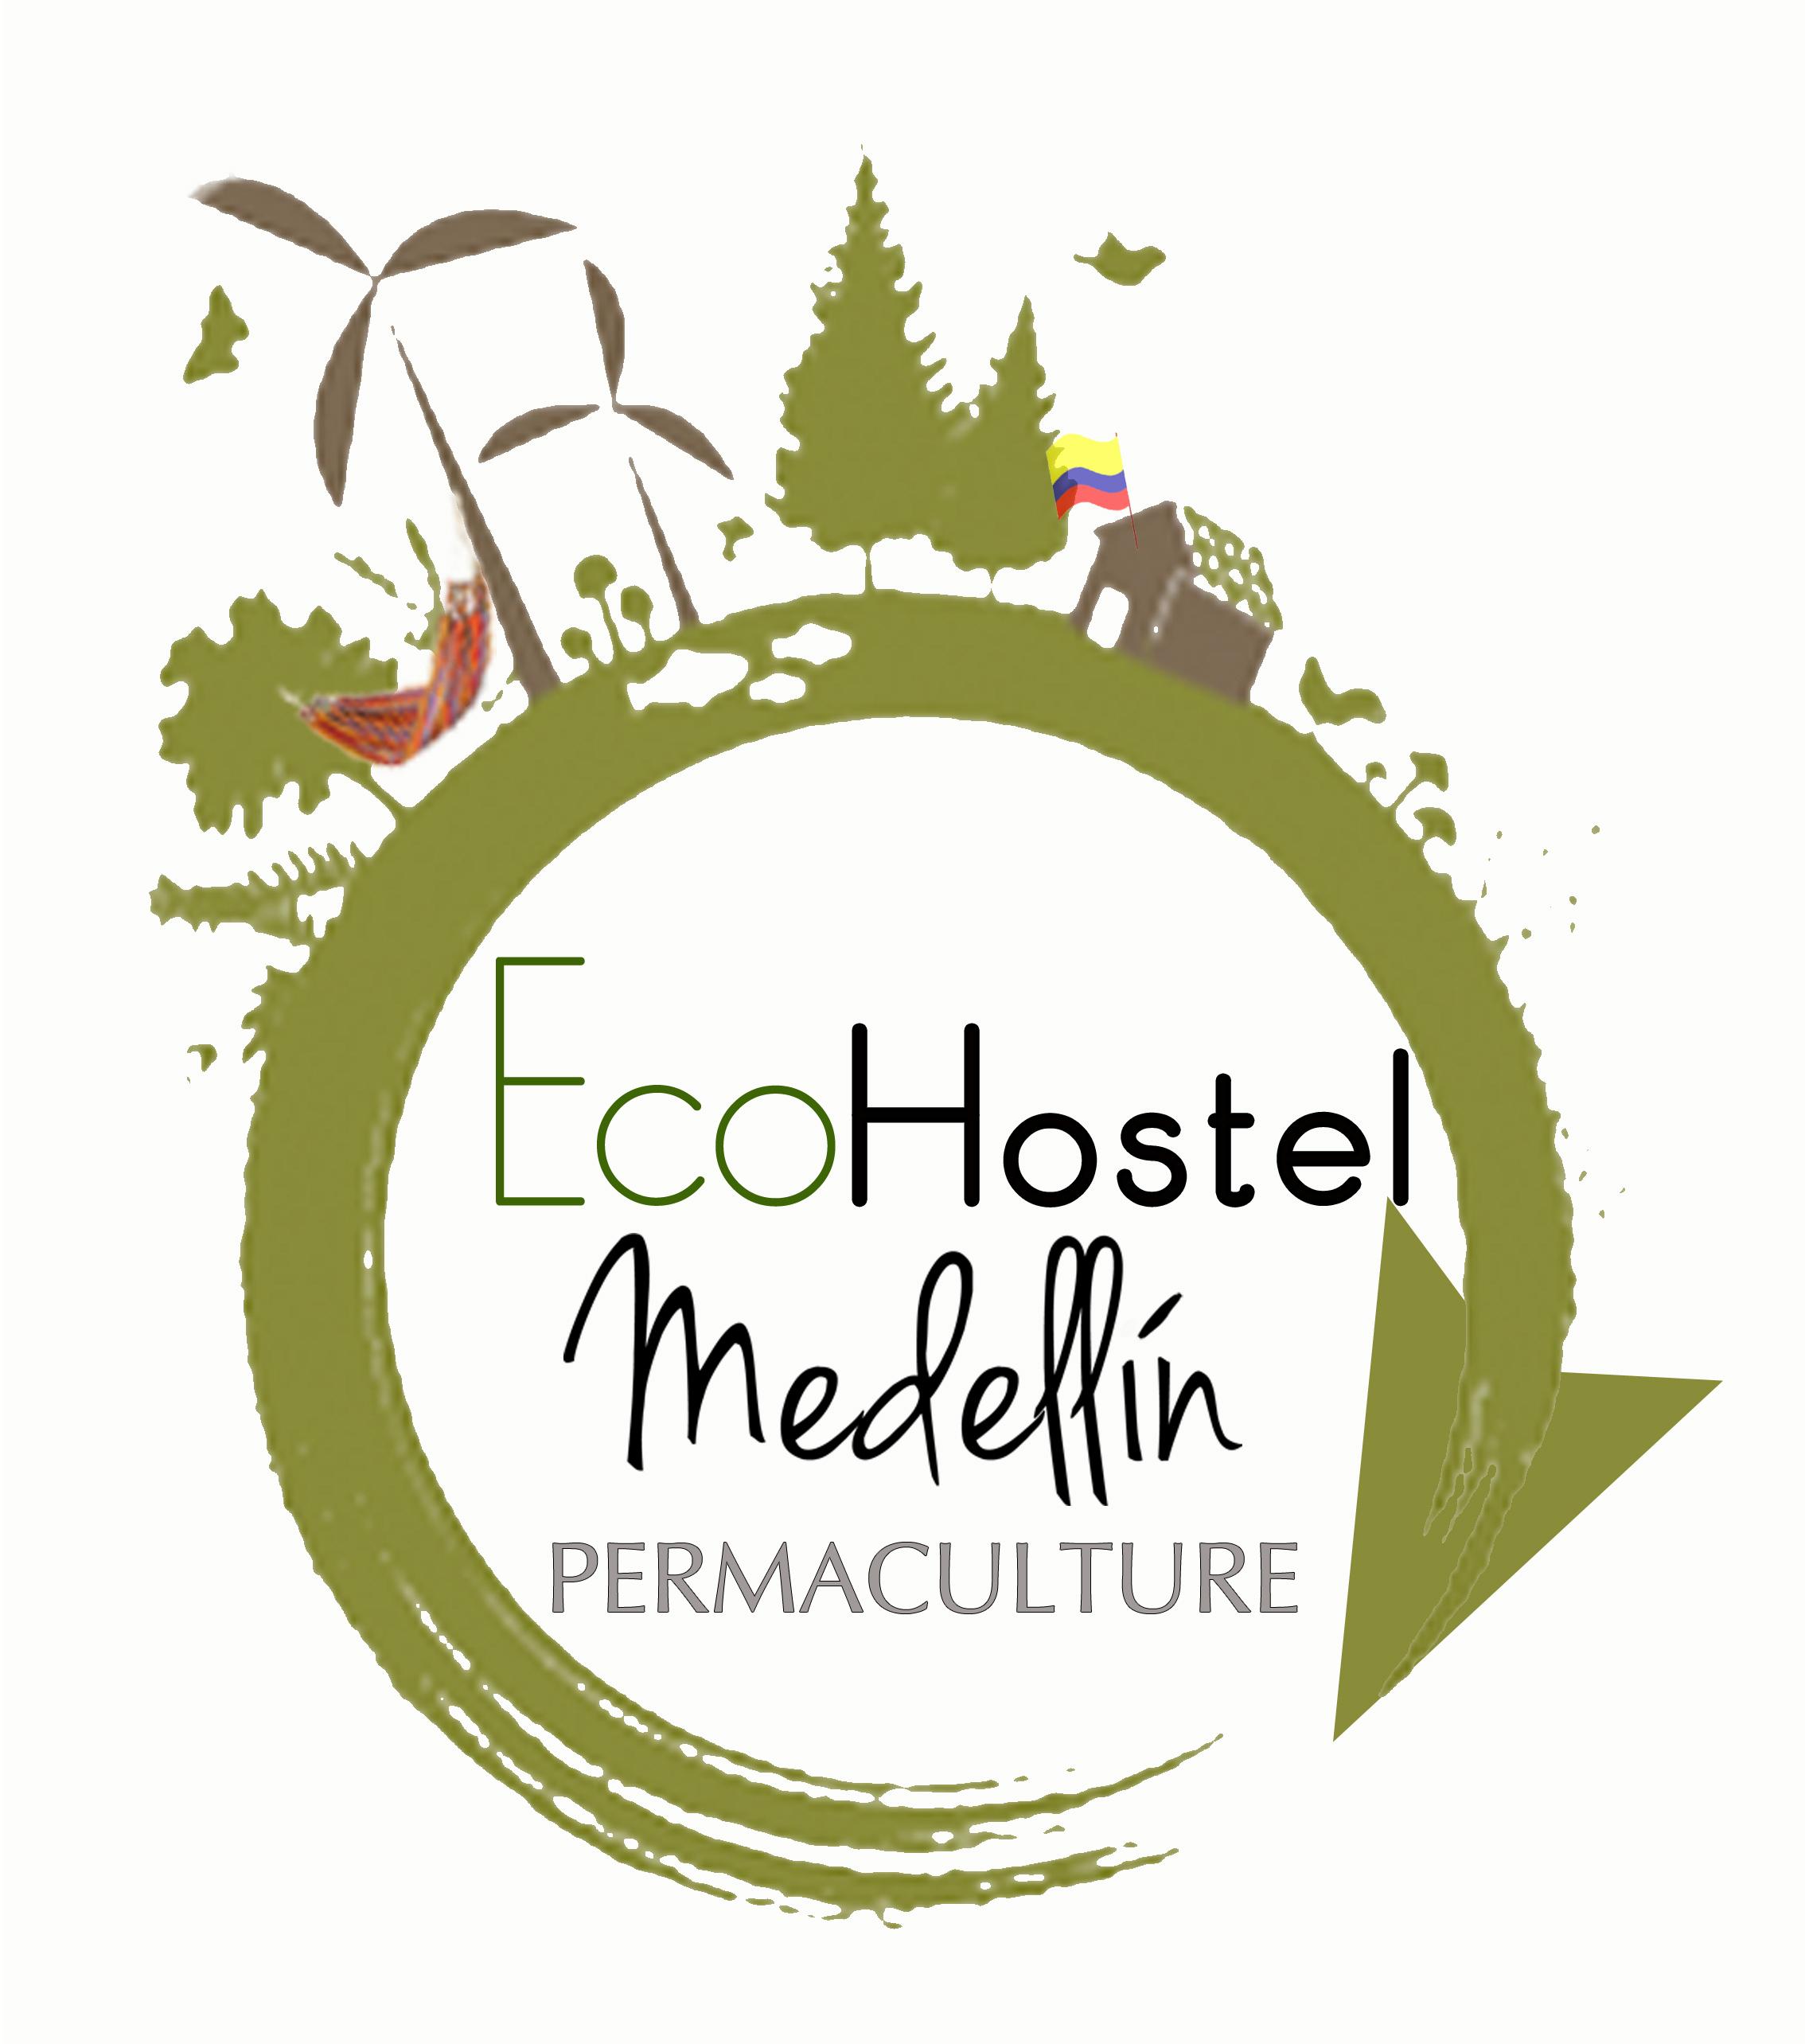 Ecohostel Medellin logo